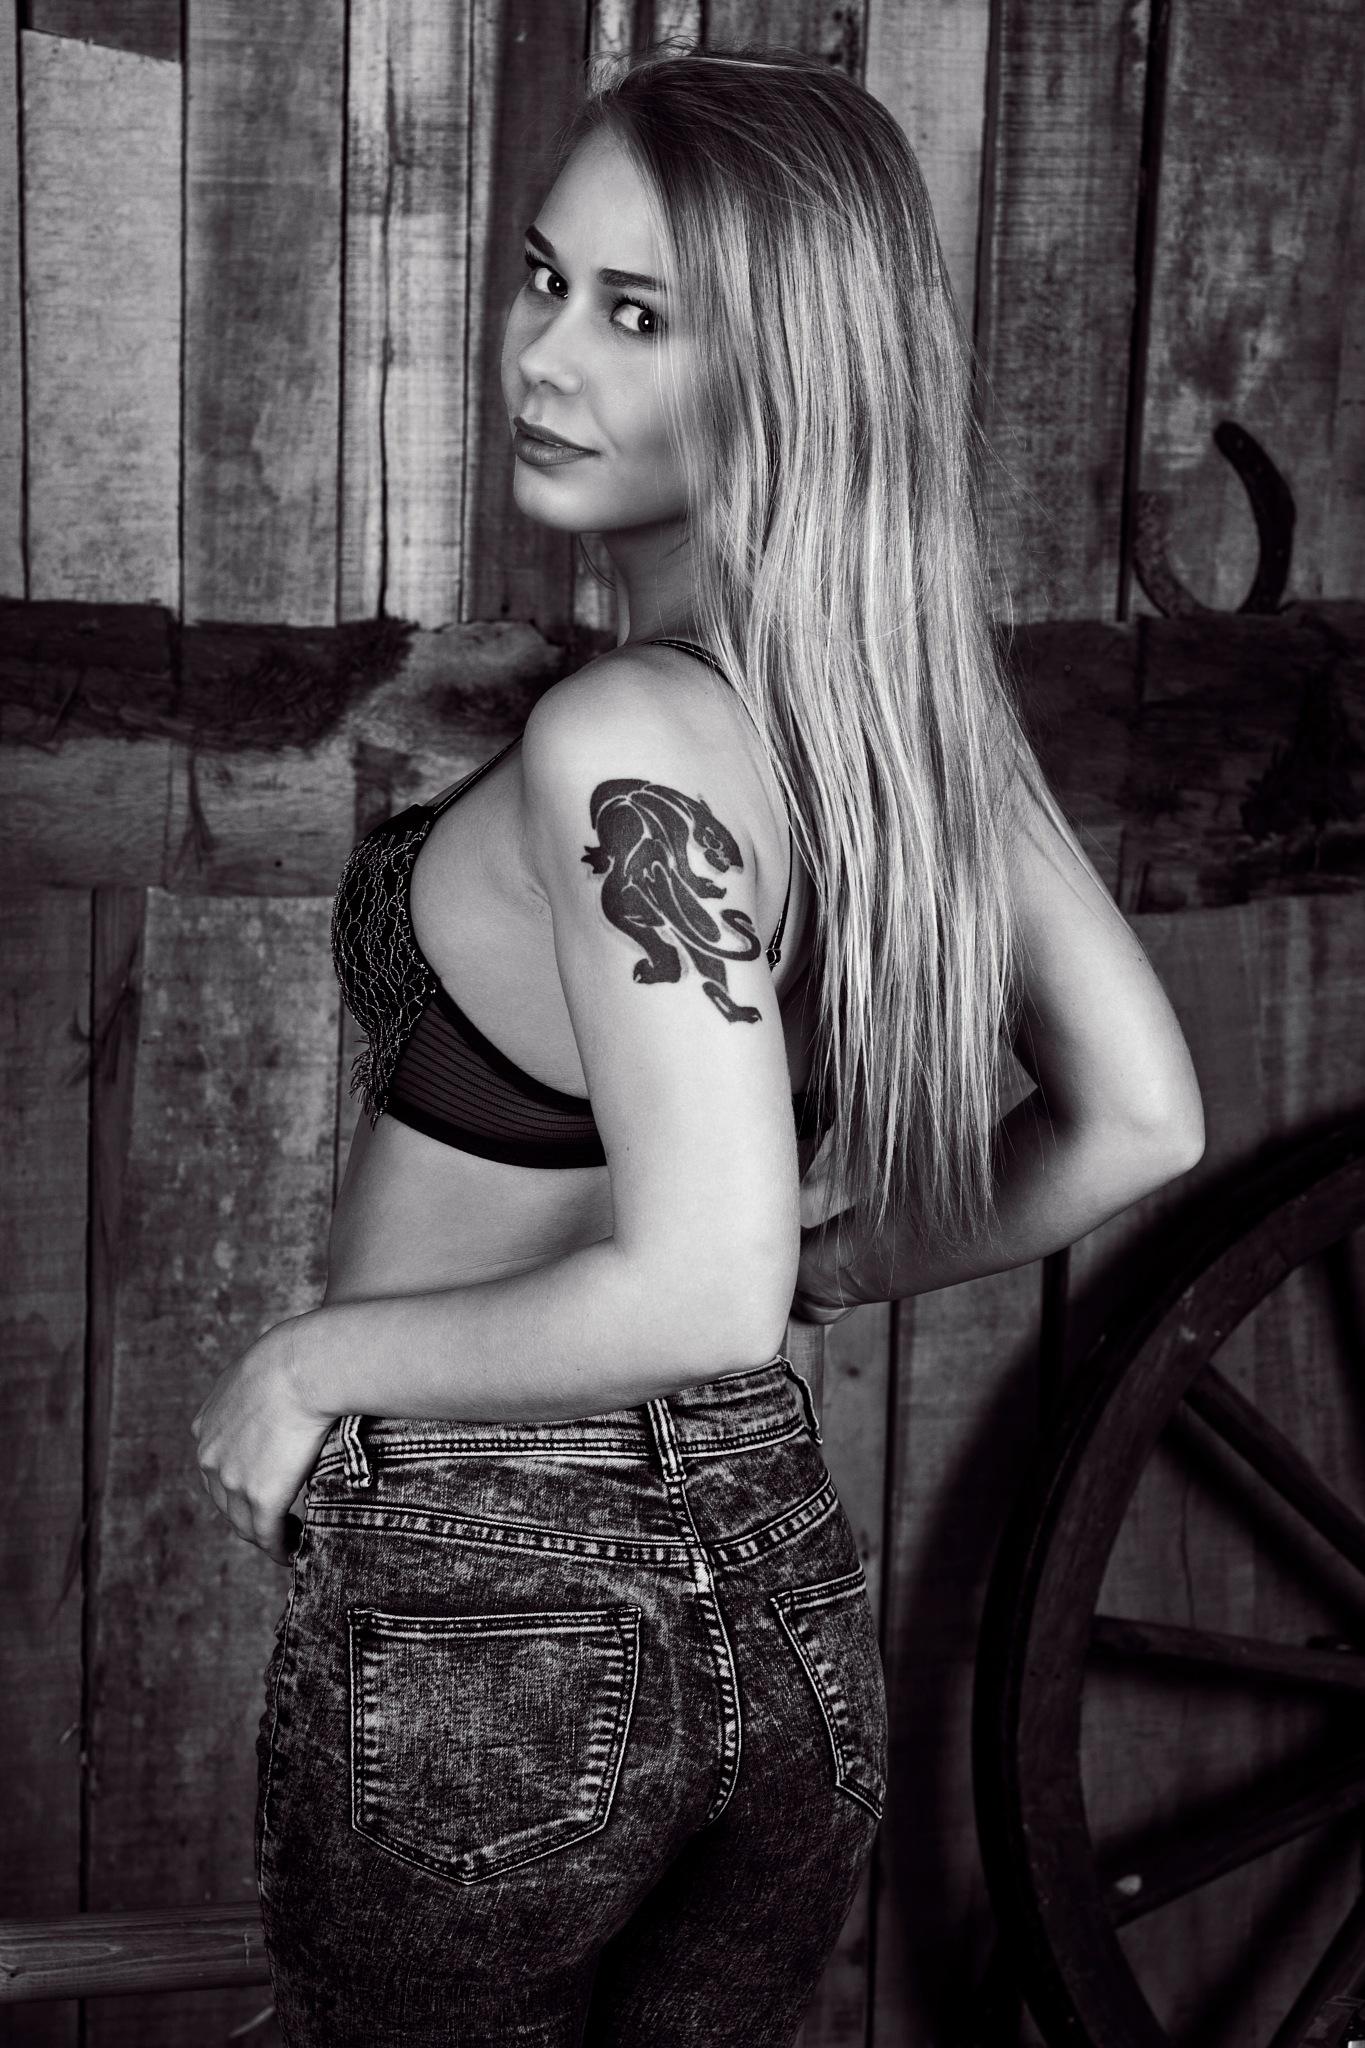 Darina in jeans by JHFotowereld